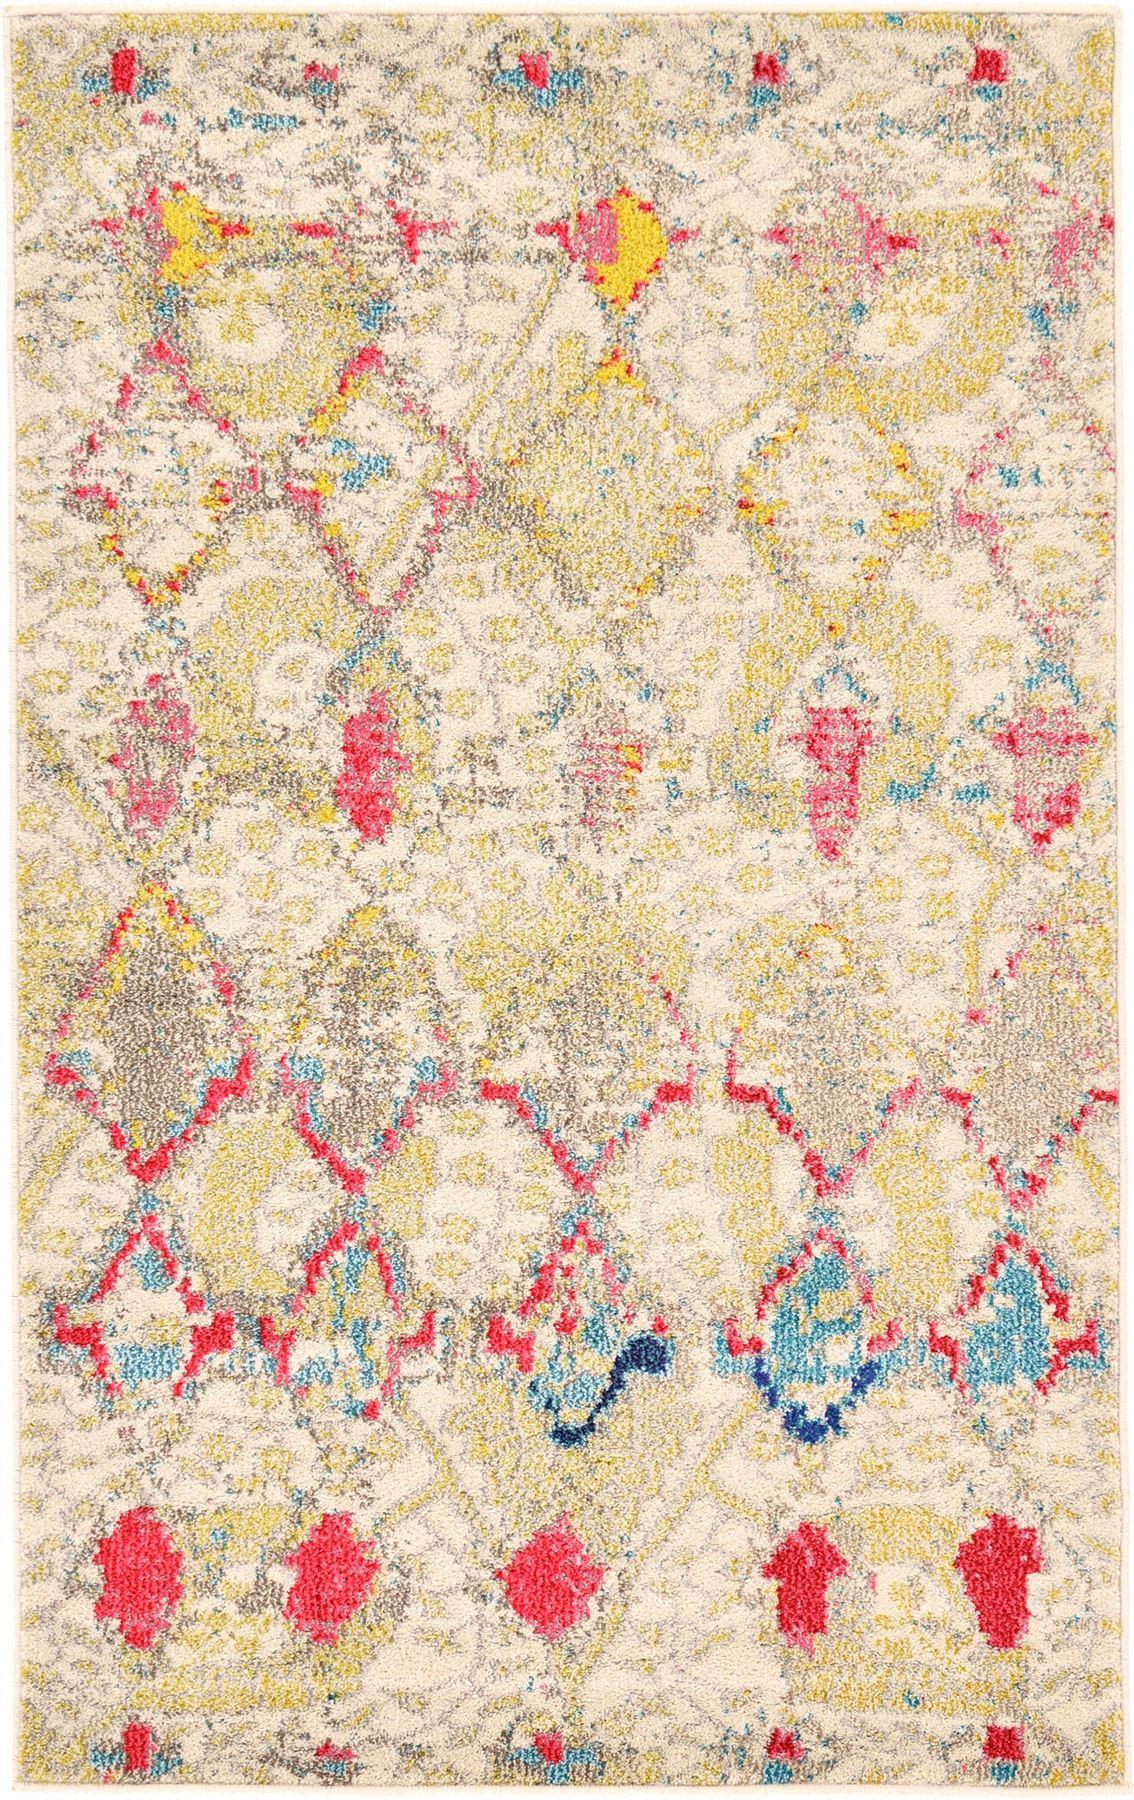 Fringeless Floor Rug Area Carpet Over Dyed Catpets Modern